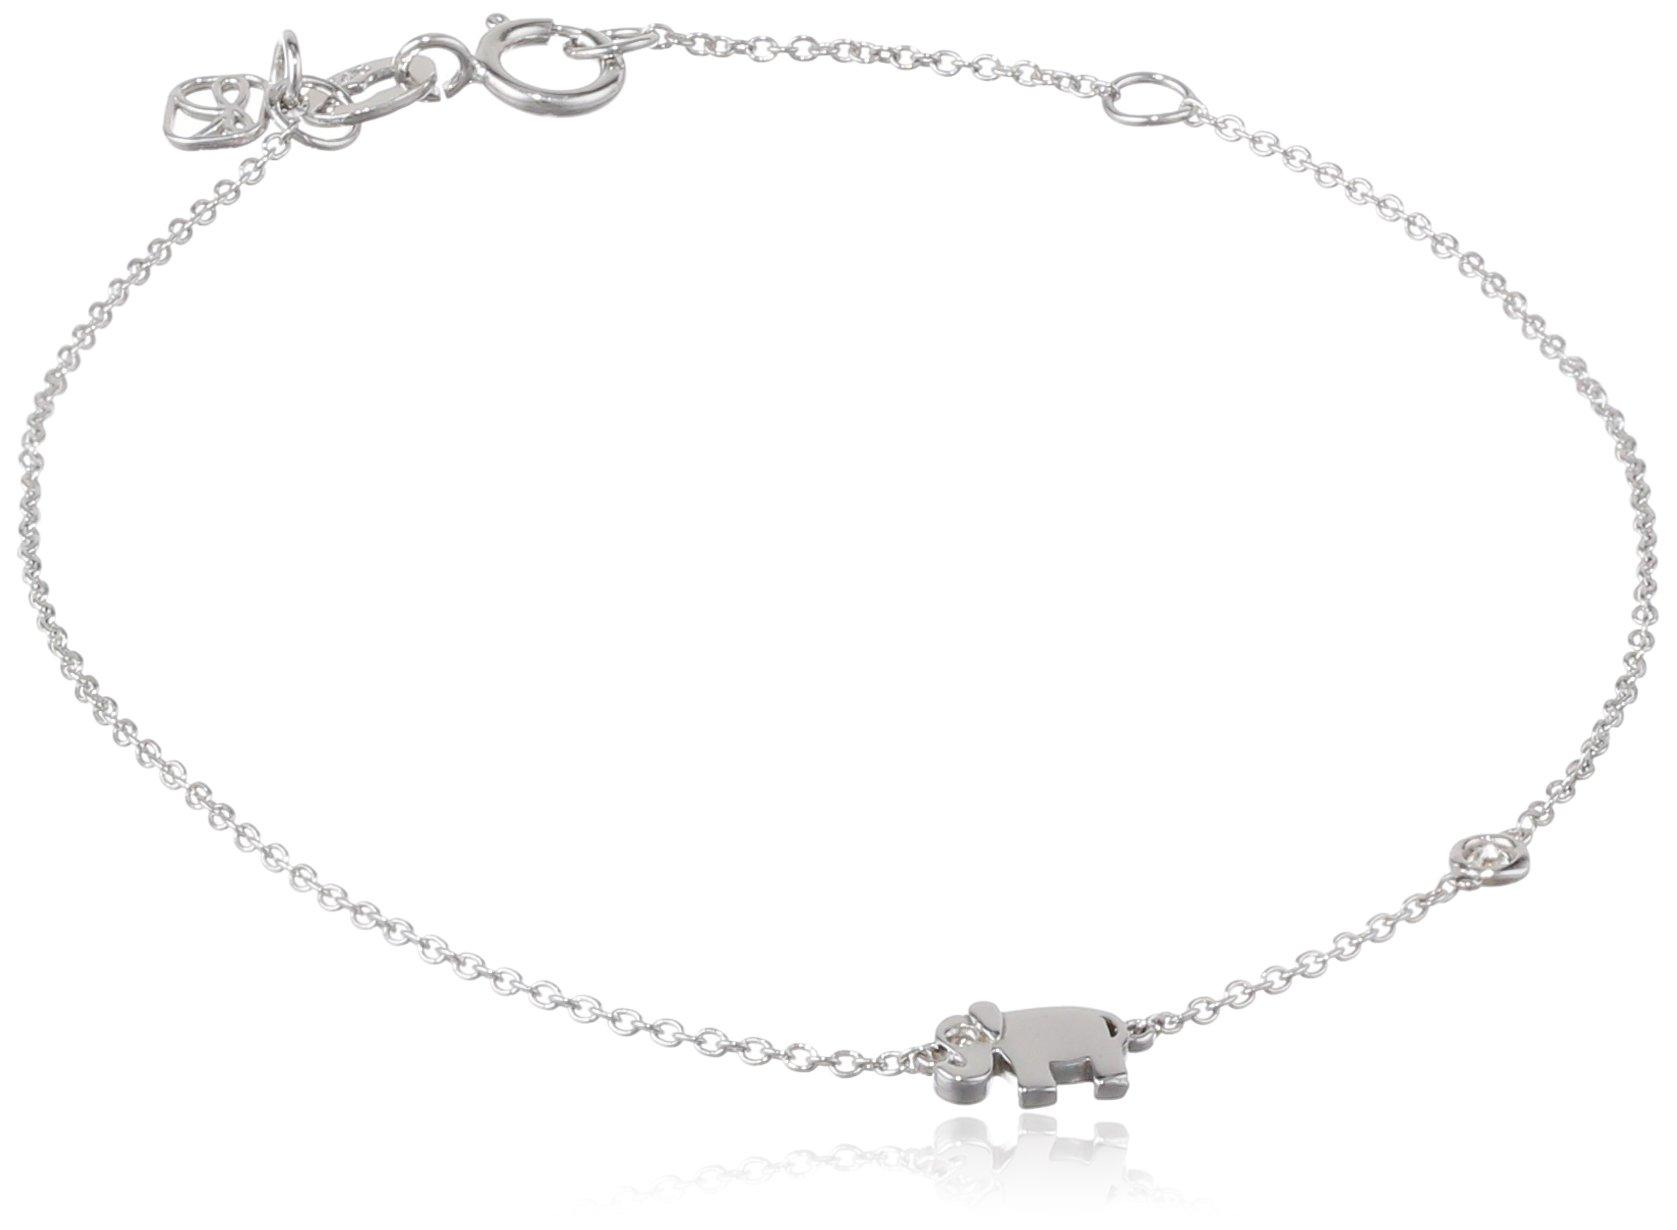 Shy by SE Elephant Bracelet with Bezel Set and Burnished Diamond